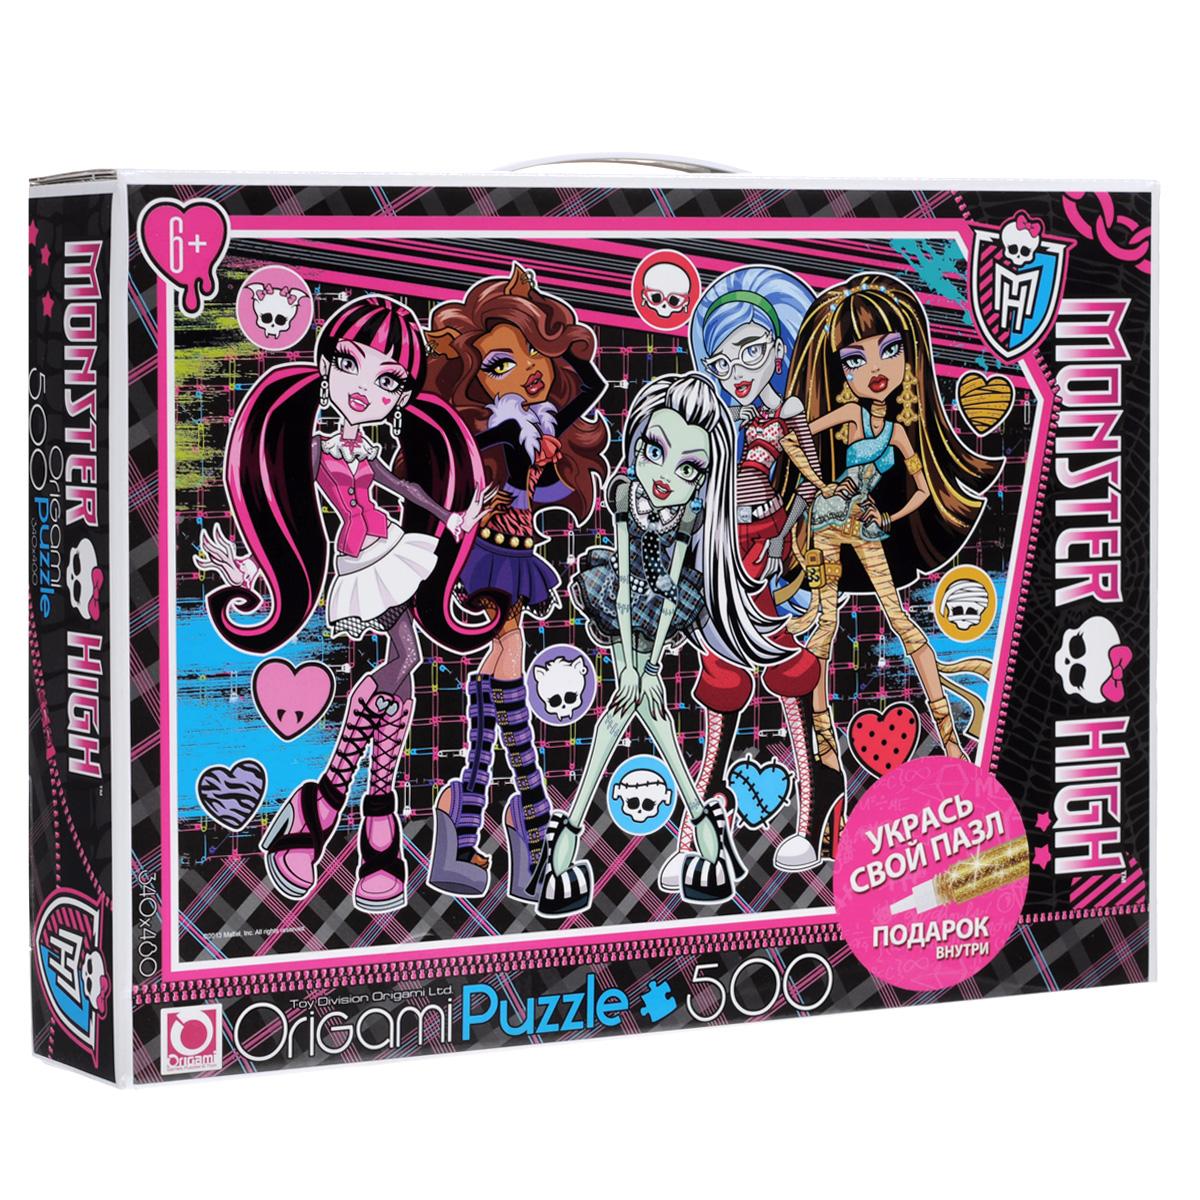 Monster High. Пазл, 500 элементов. 05489